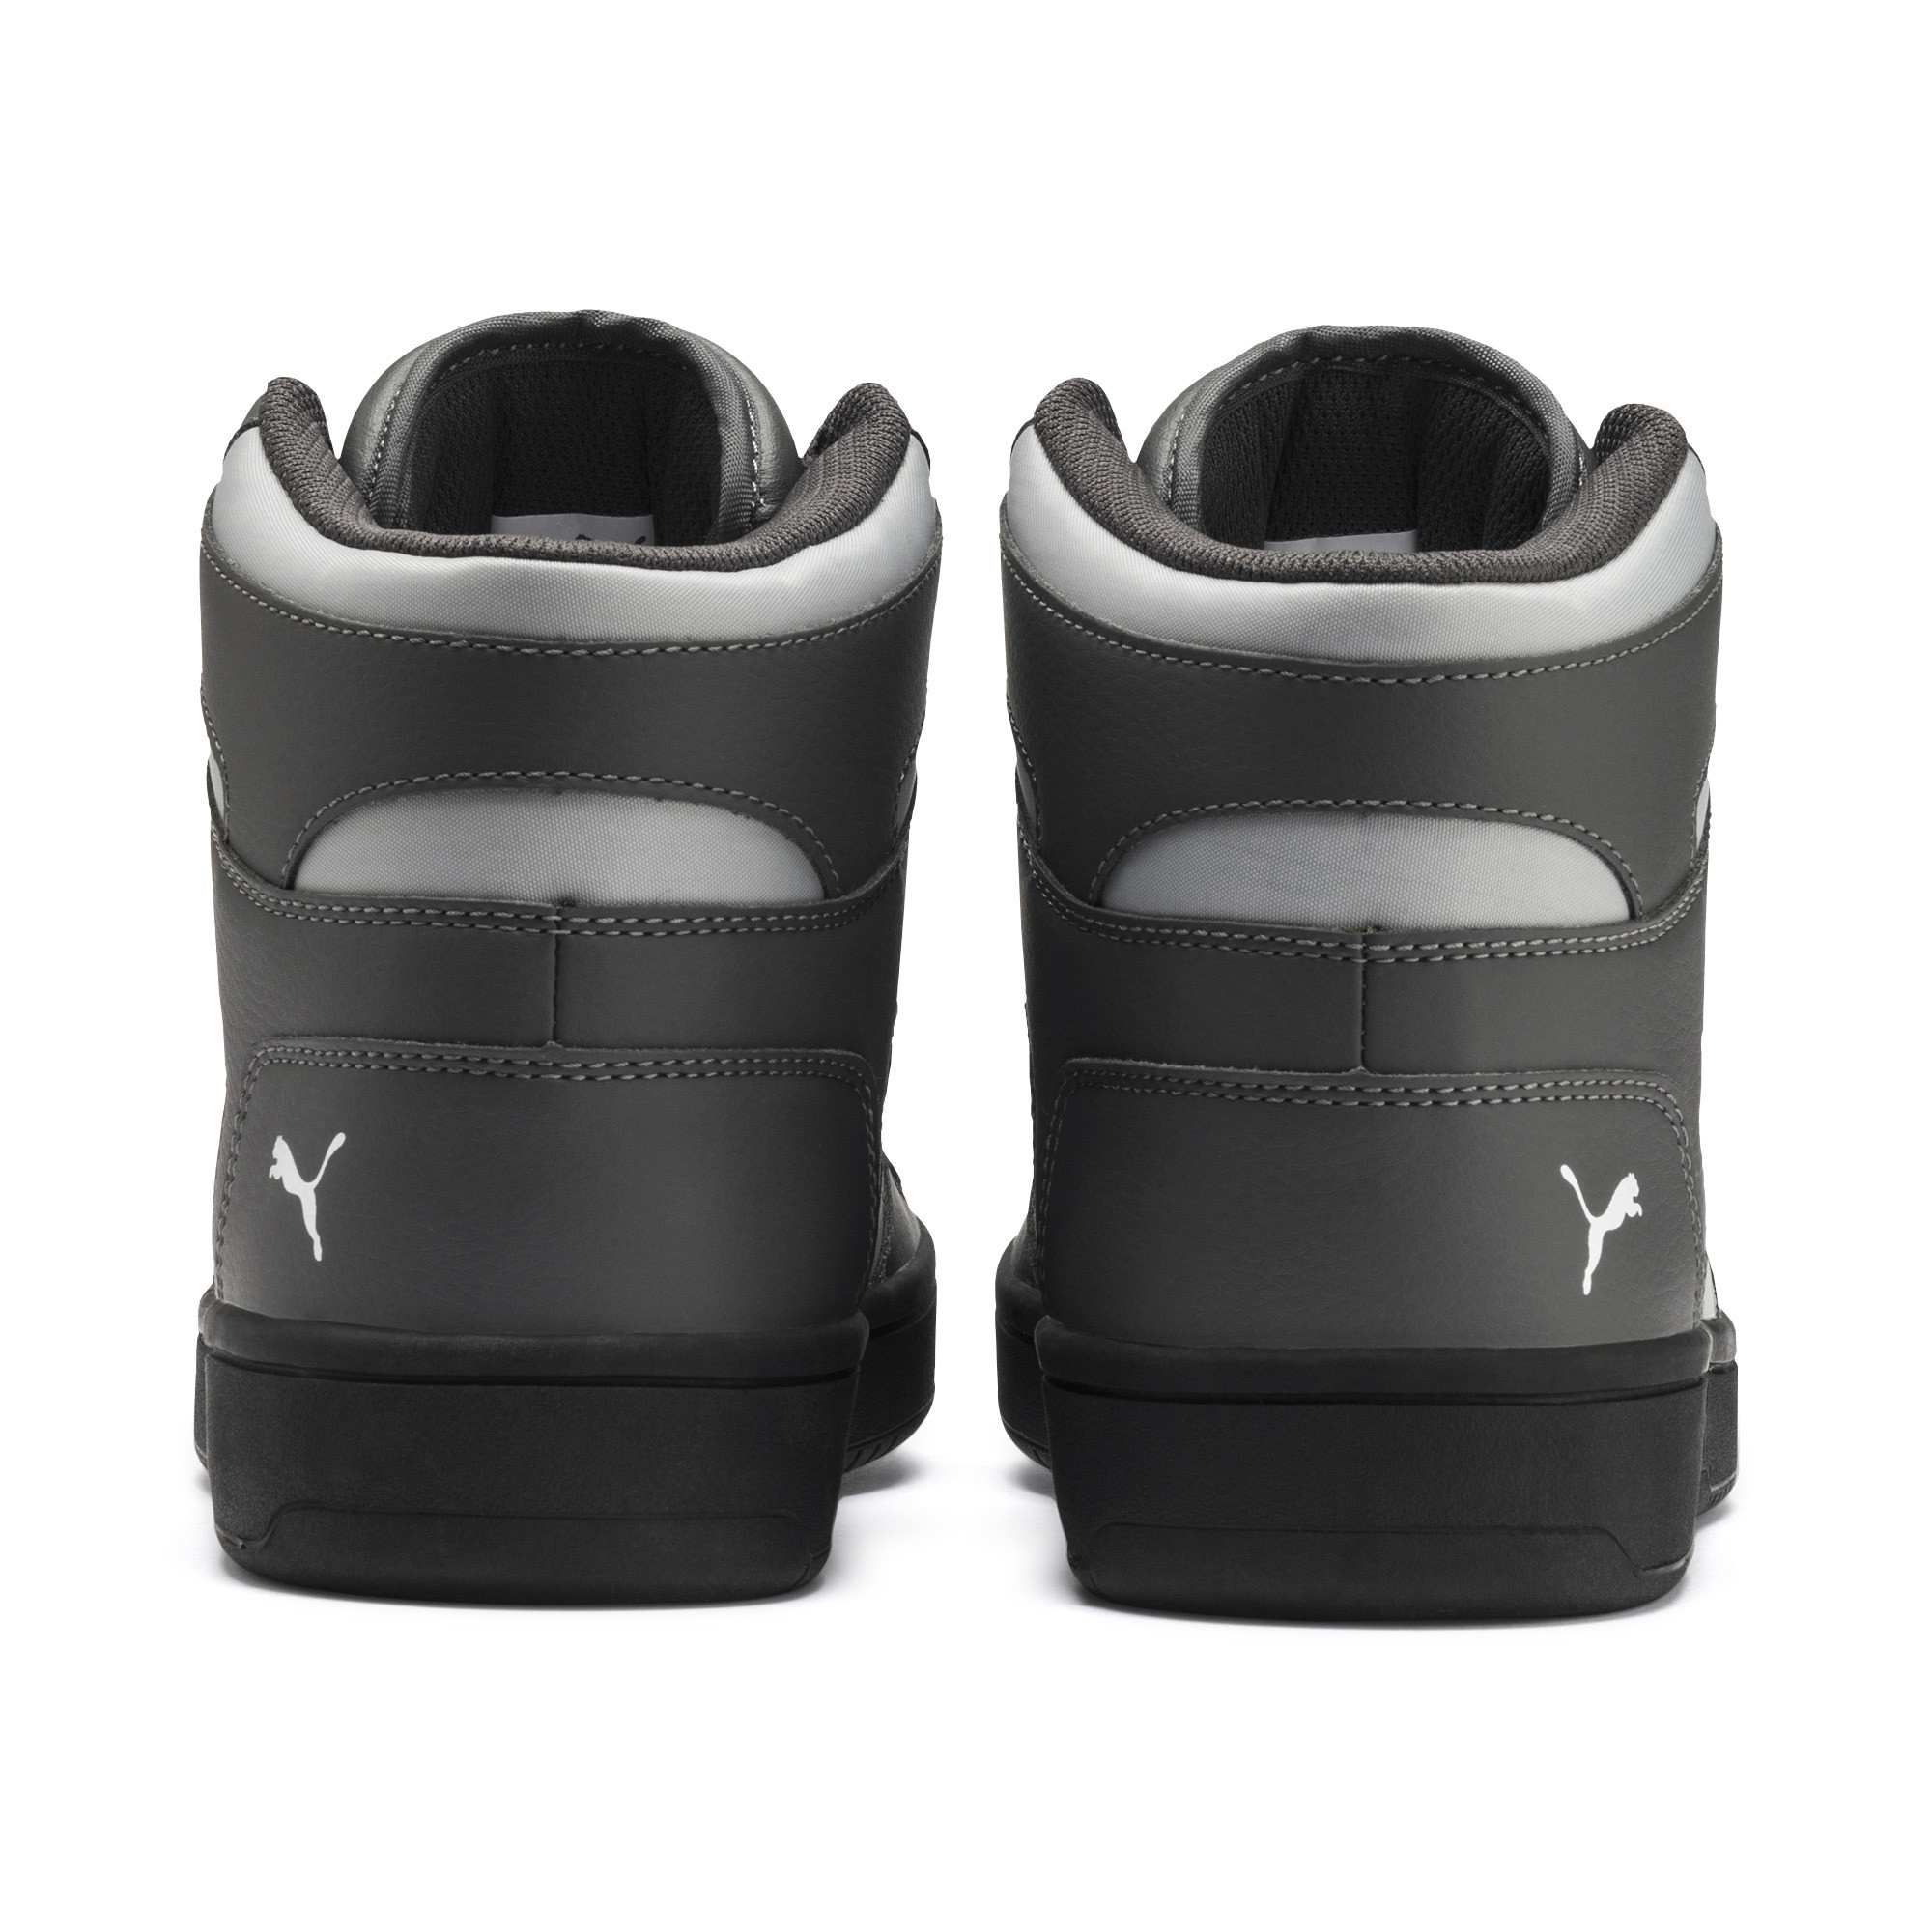 PUMA-PUMA-Rebound-LayUp-Men-039-s-Sneakers-Men-Mid-Boot-Basics thumbnail 9